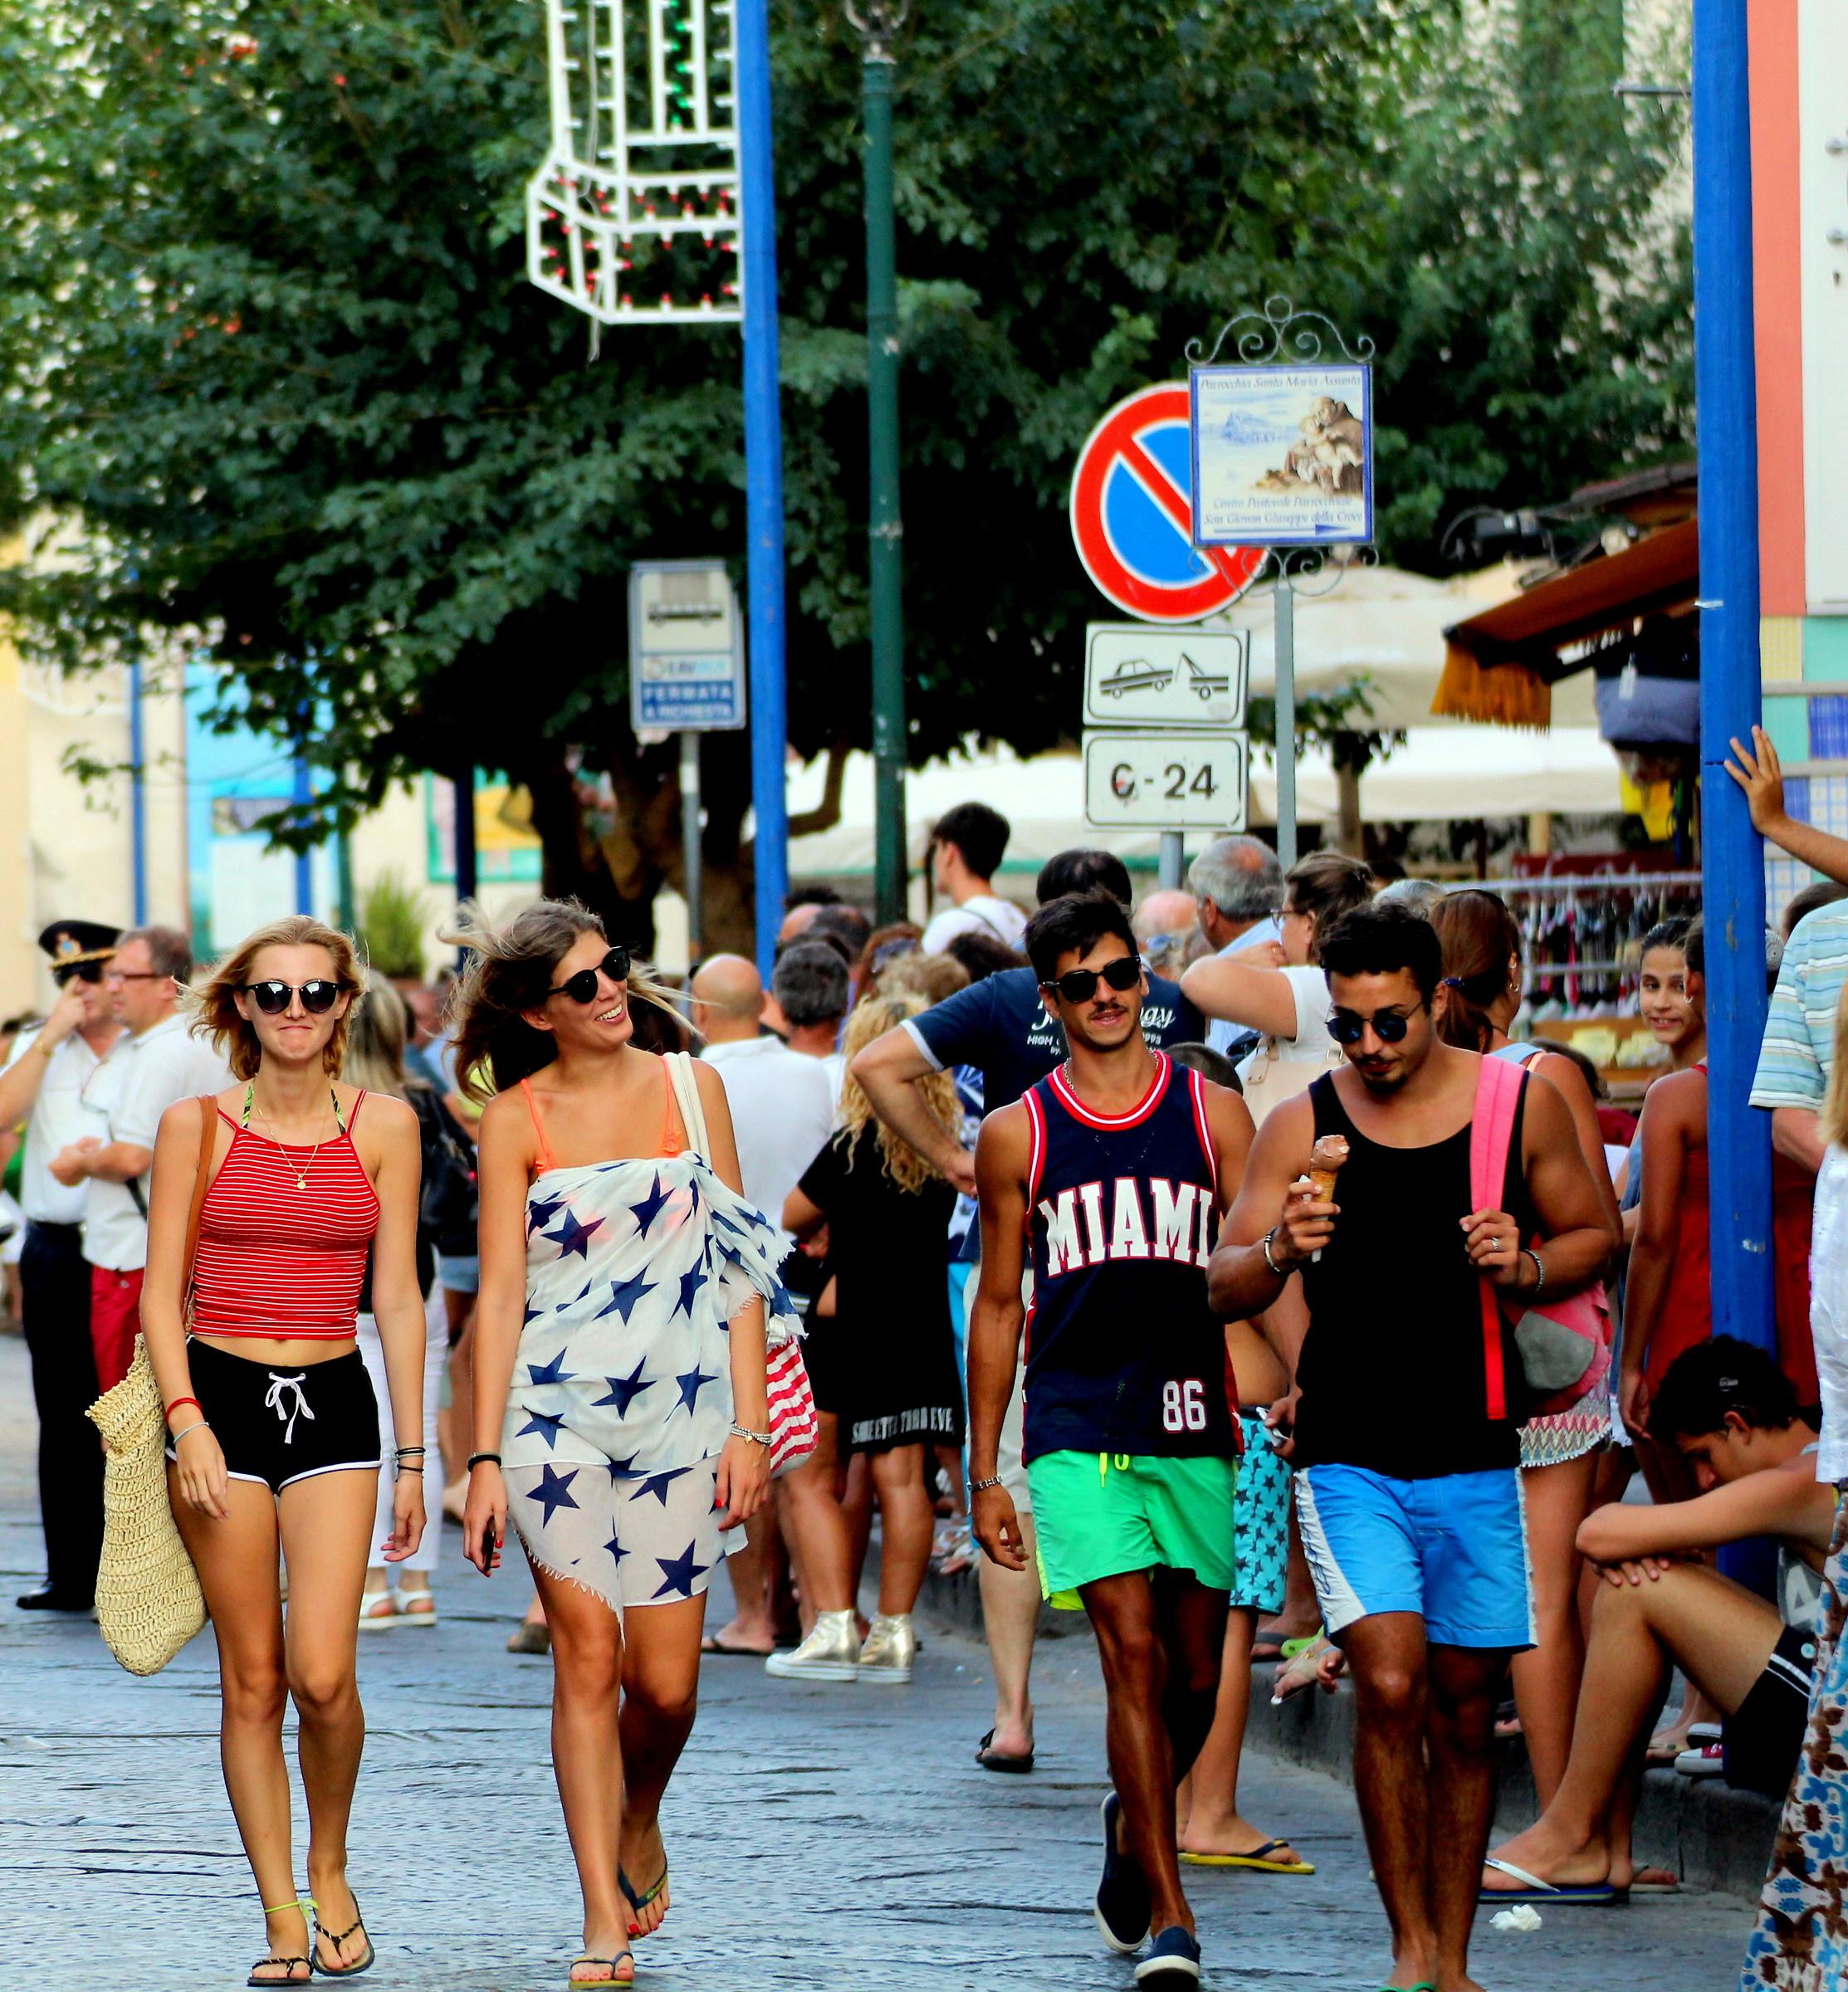 Happiness in a photo stolen. Tourist always x...